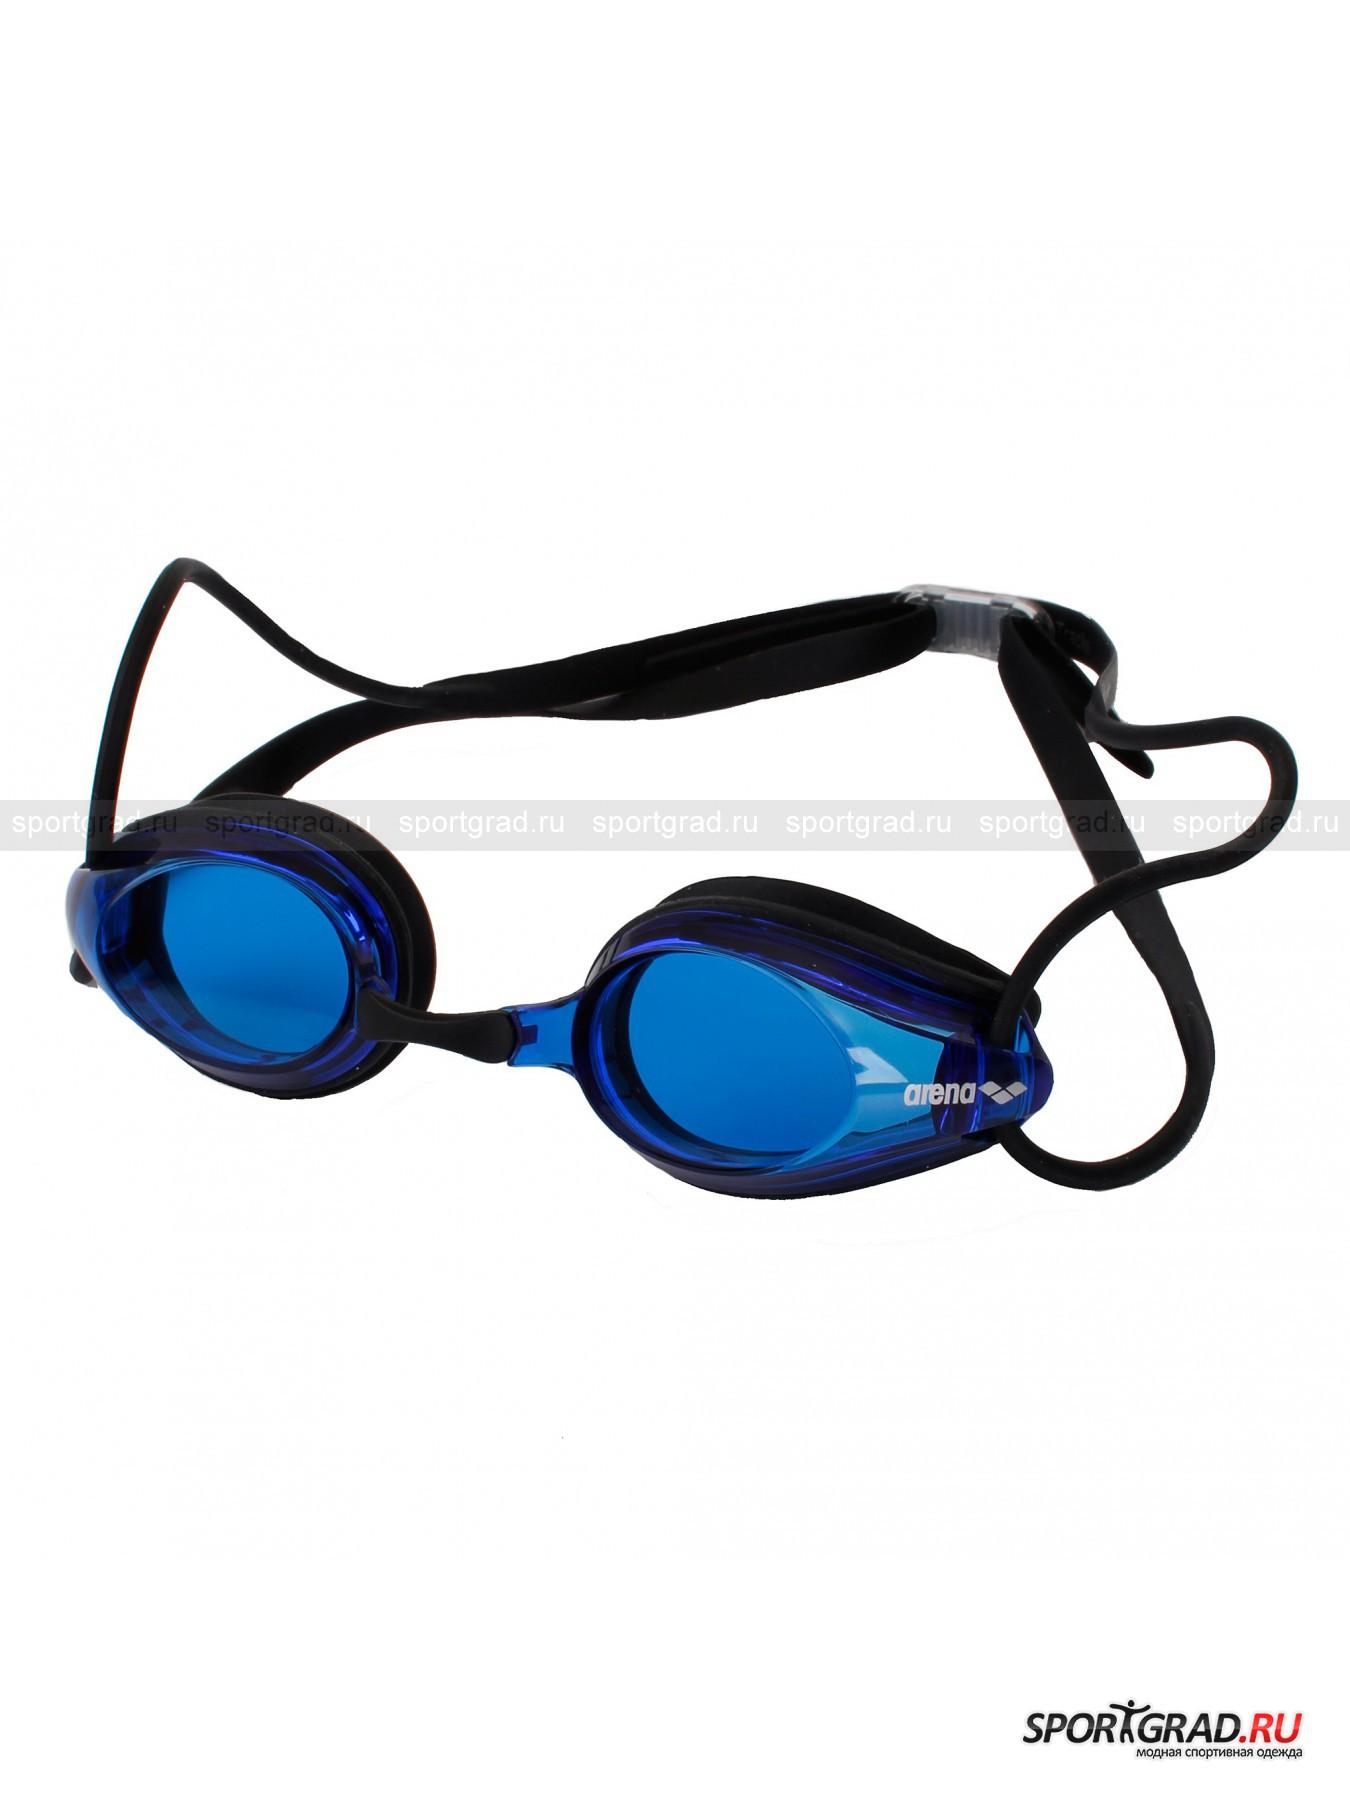 Очки для плавания ARENA Tracks